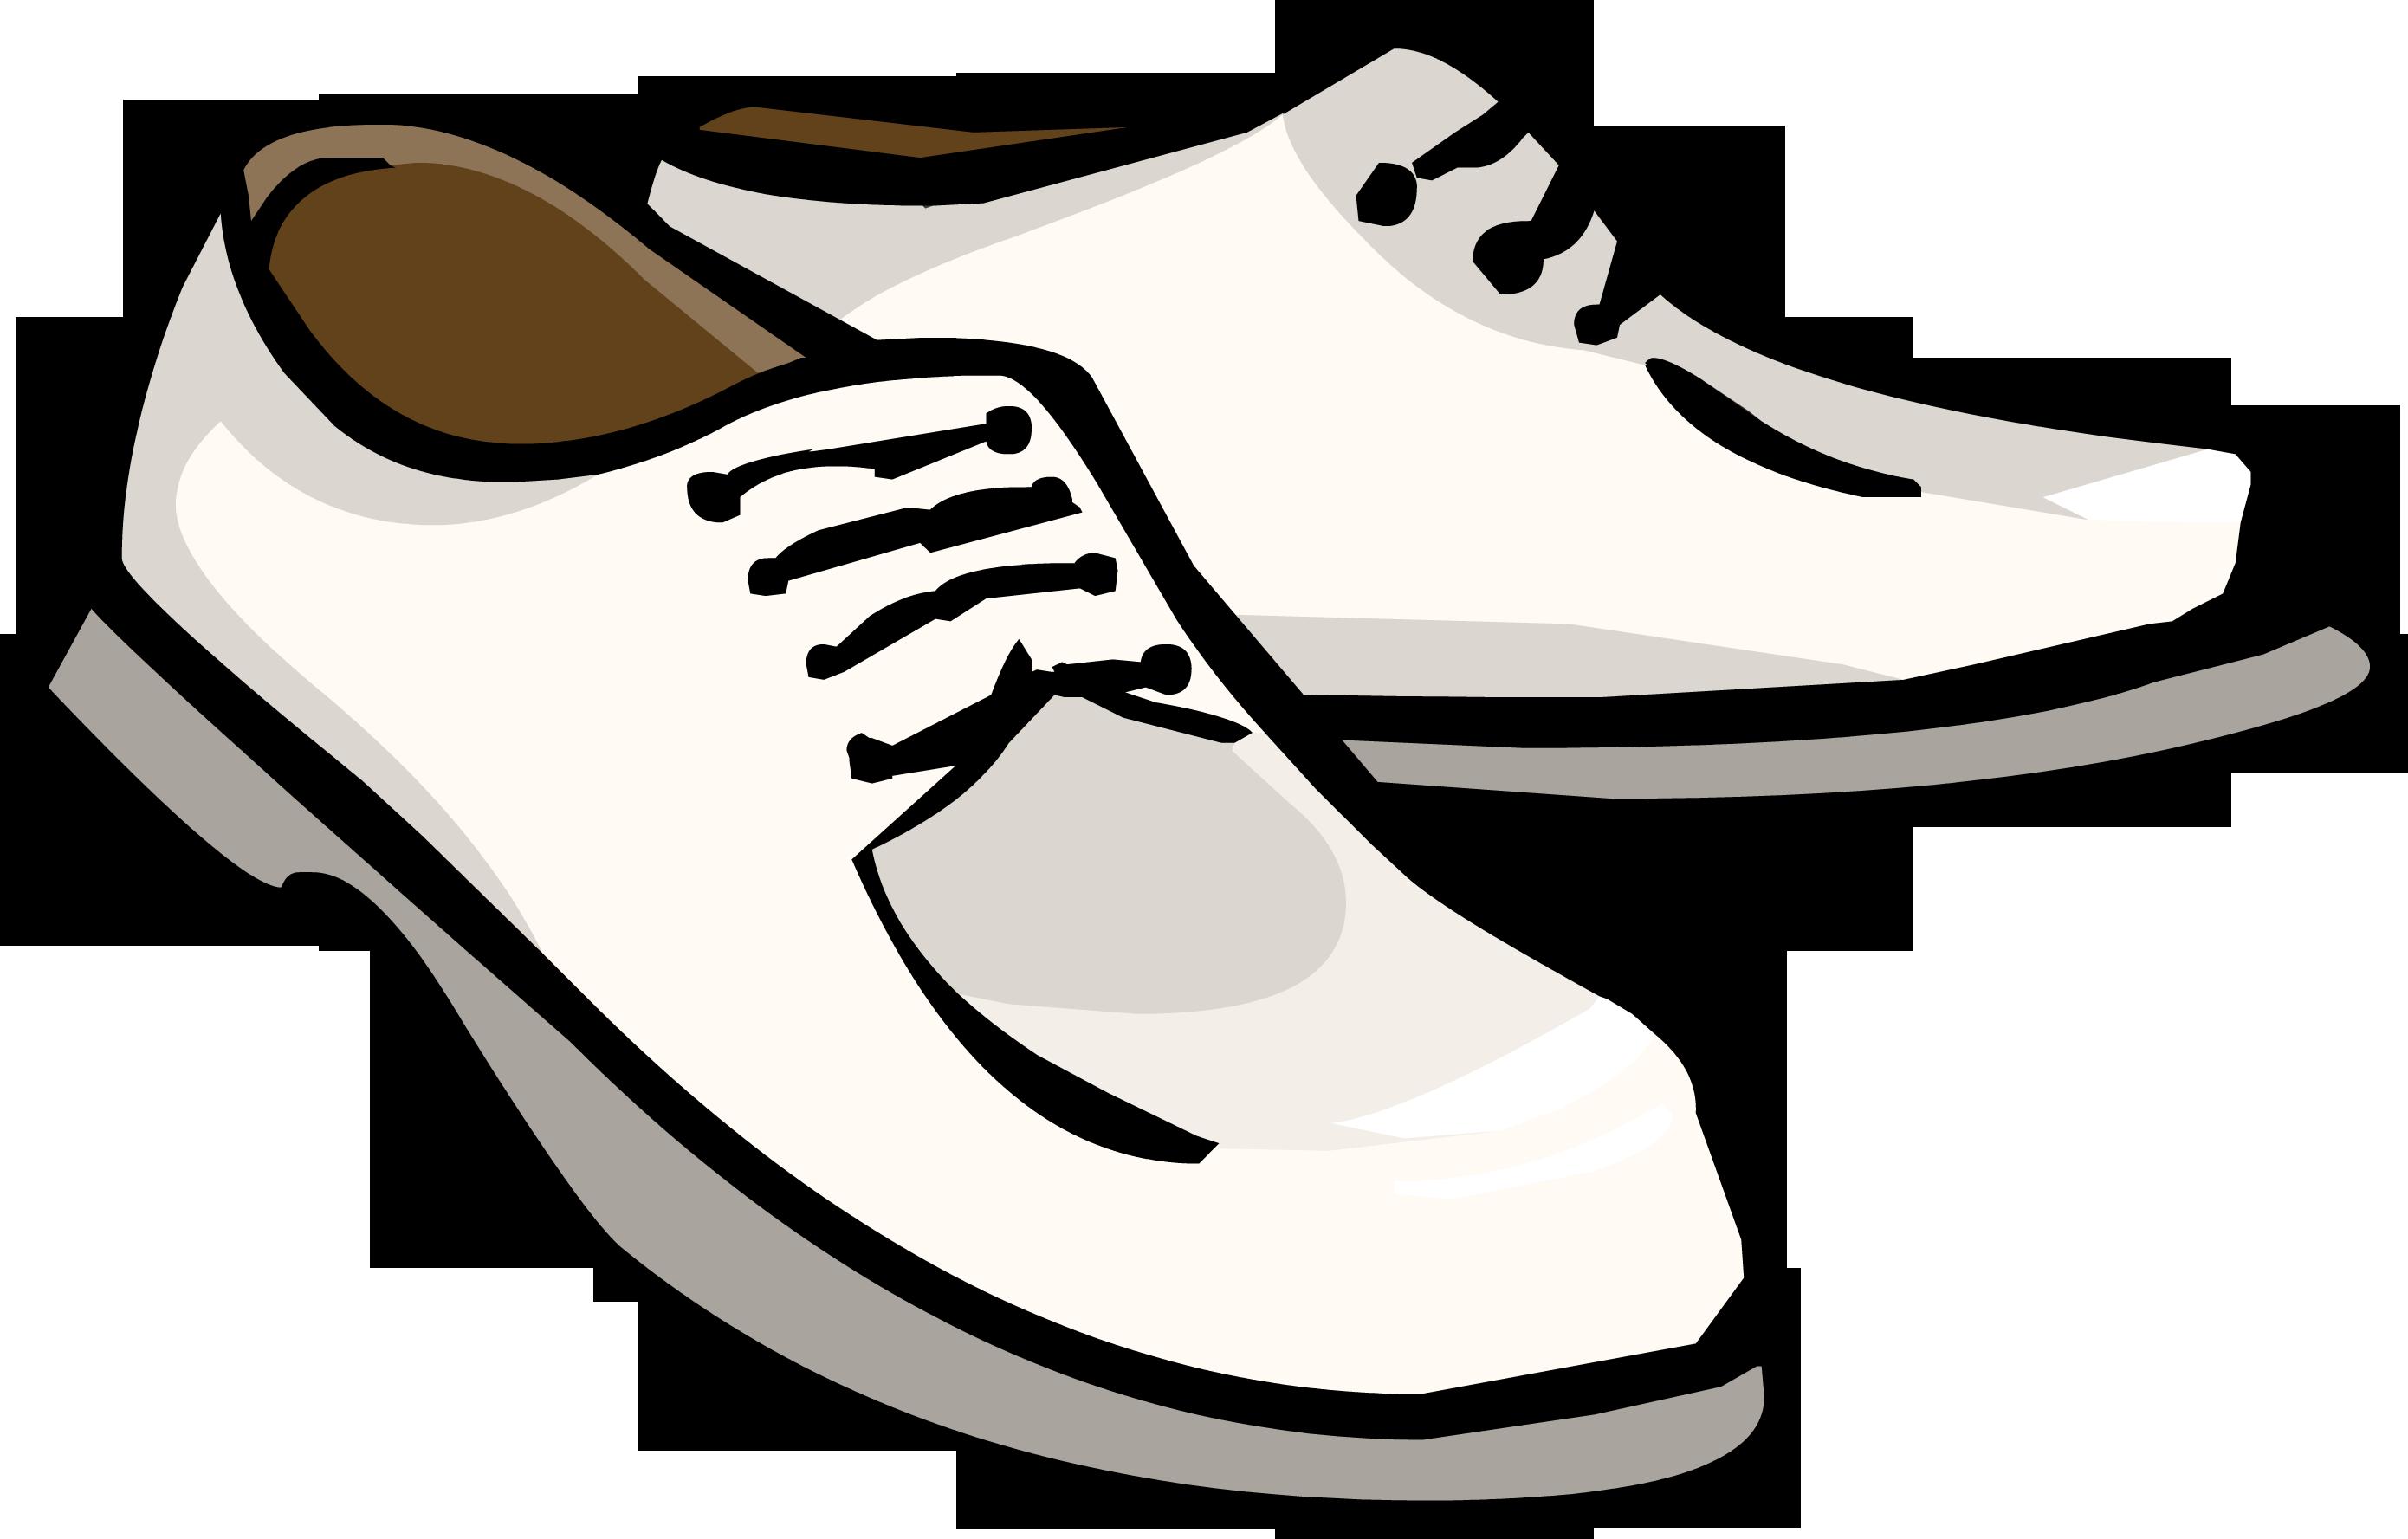 Club Penguin White Dress Shoes